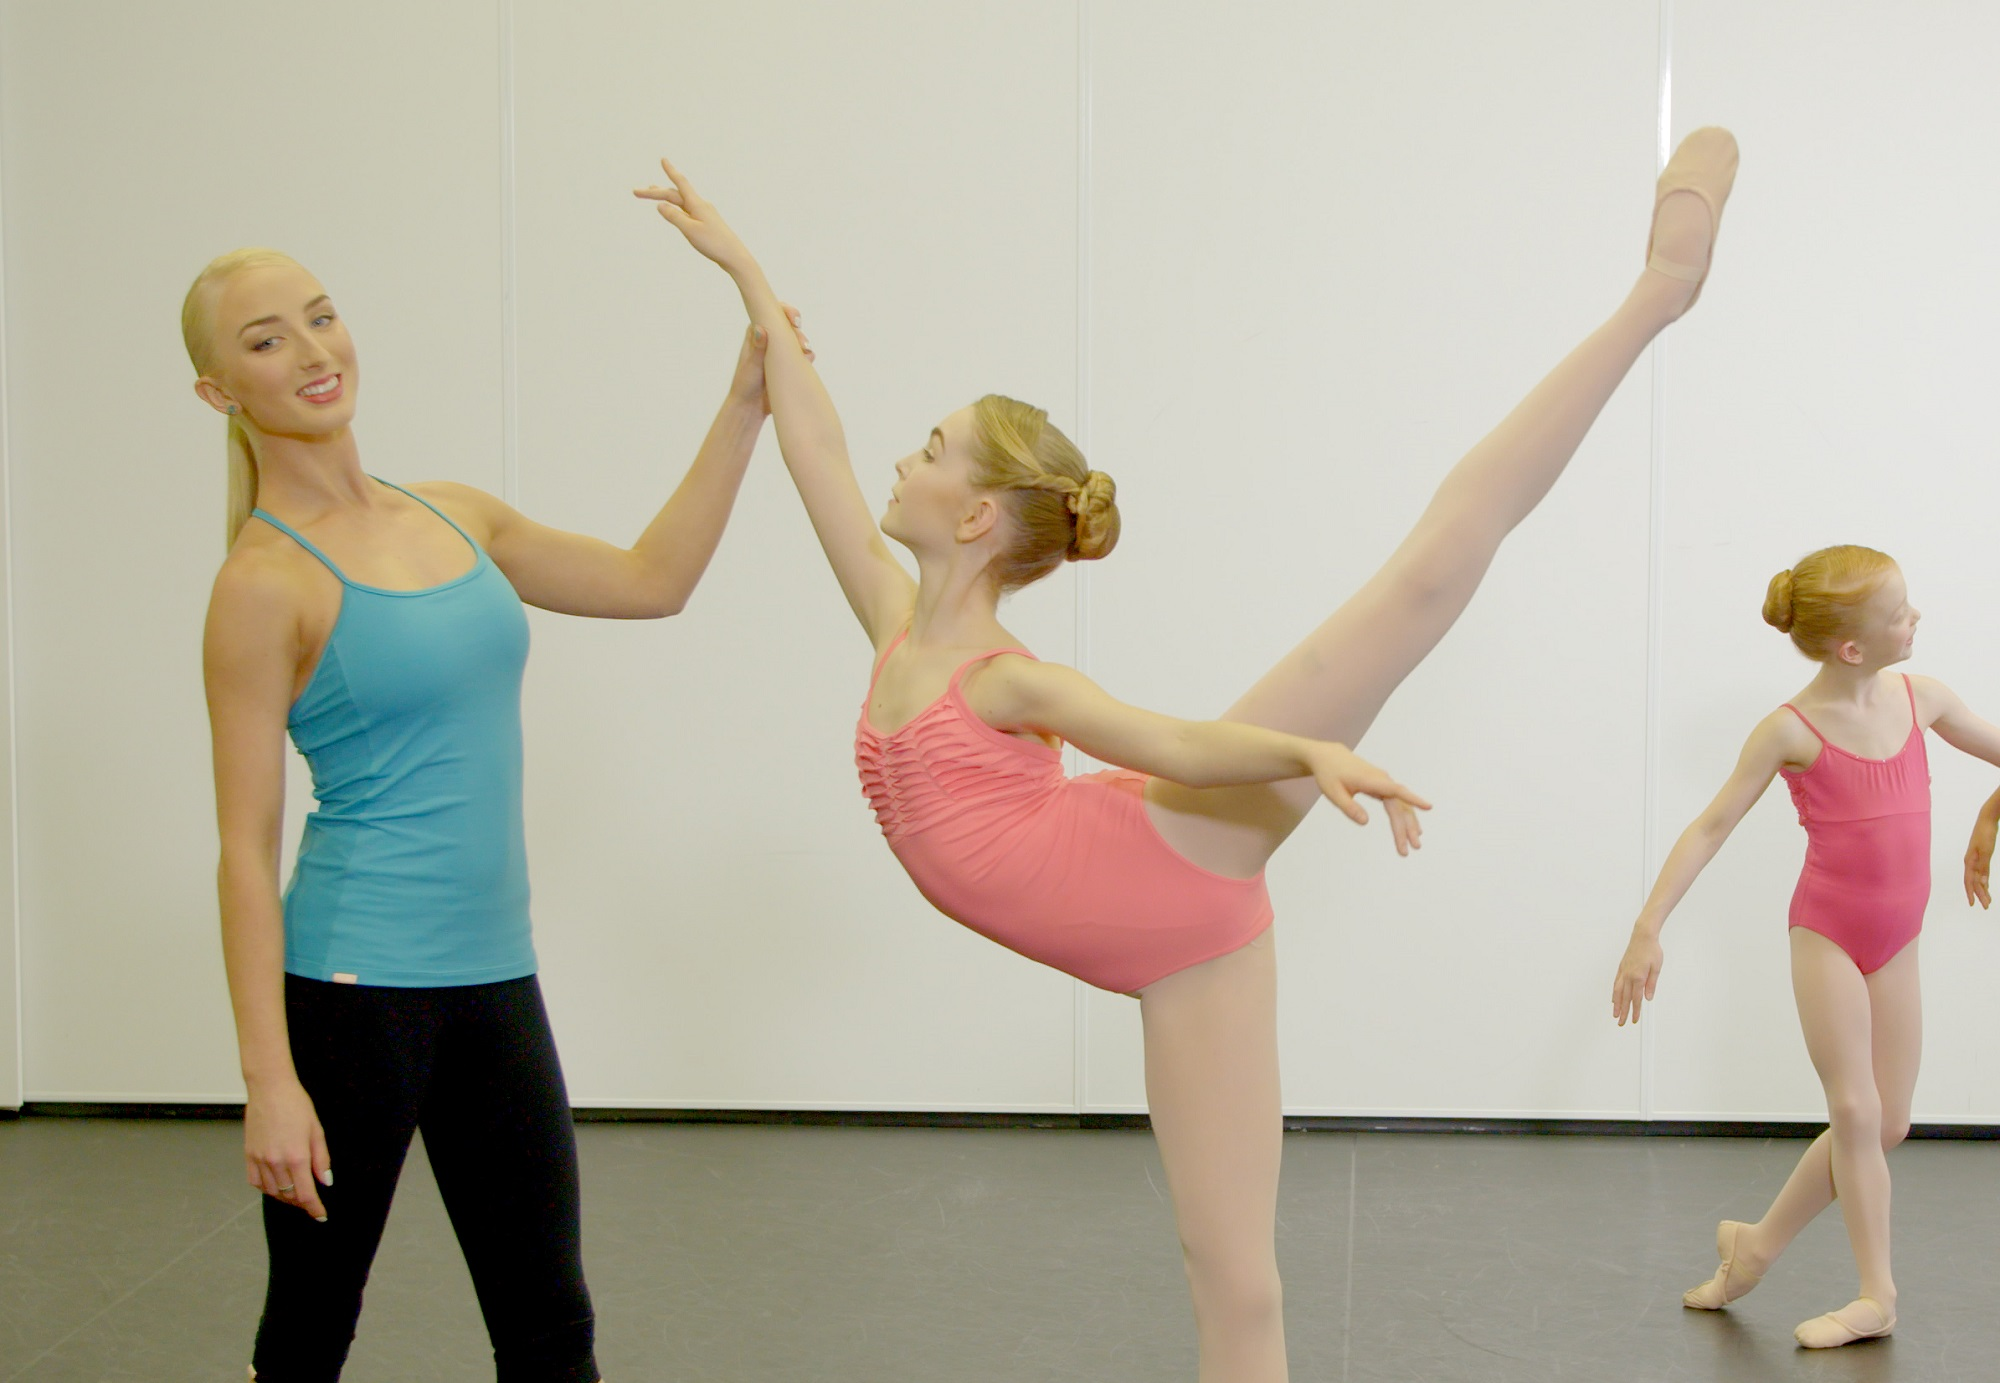 dean howard sexy Dancer